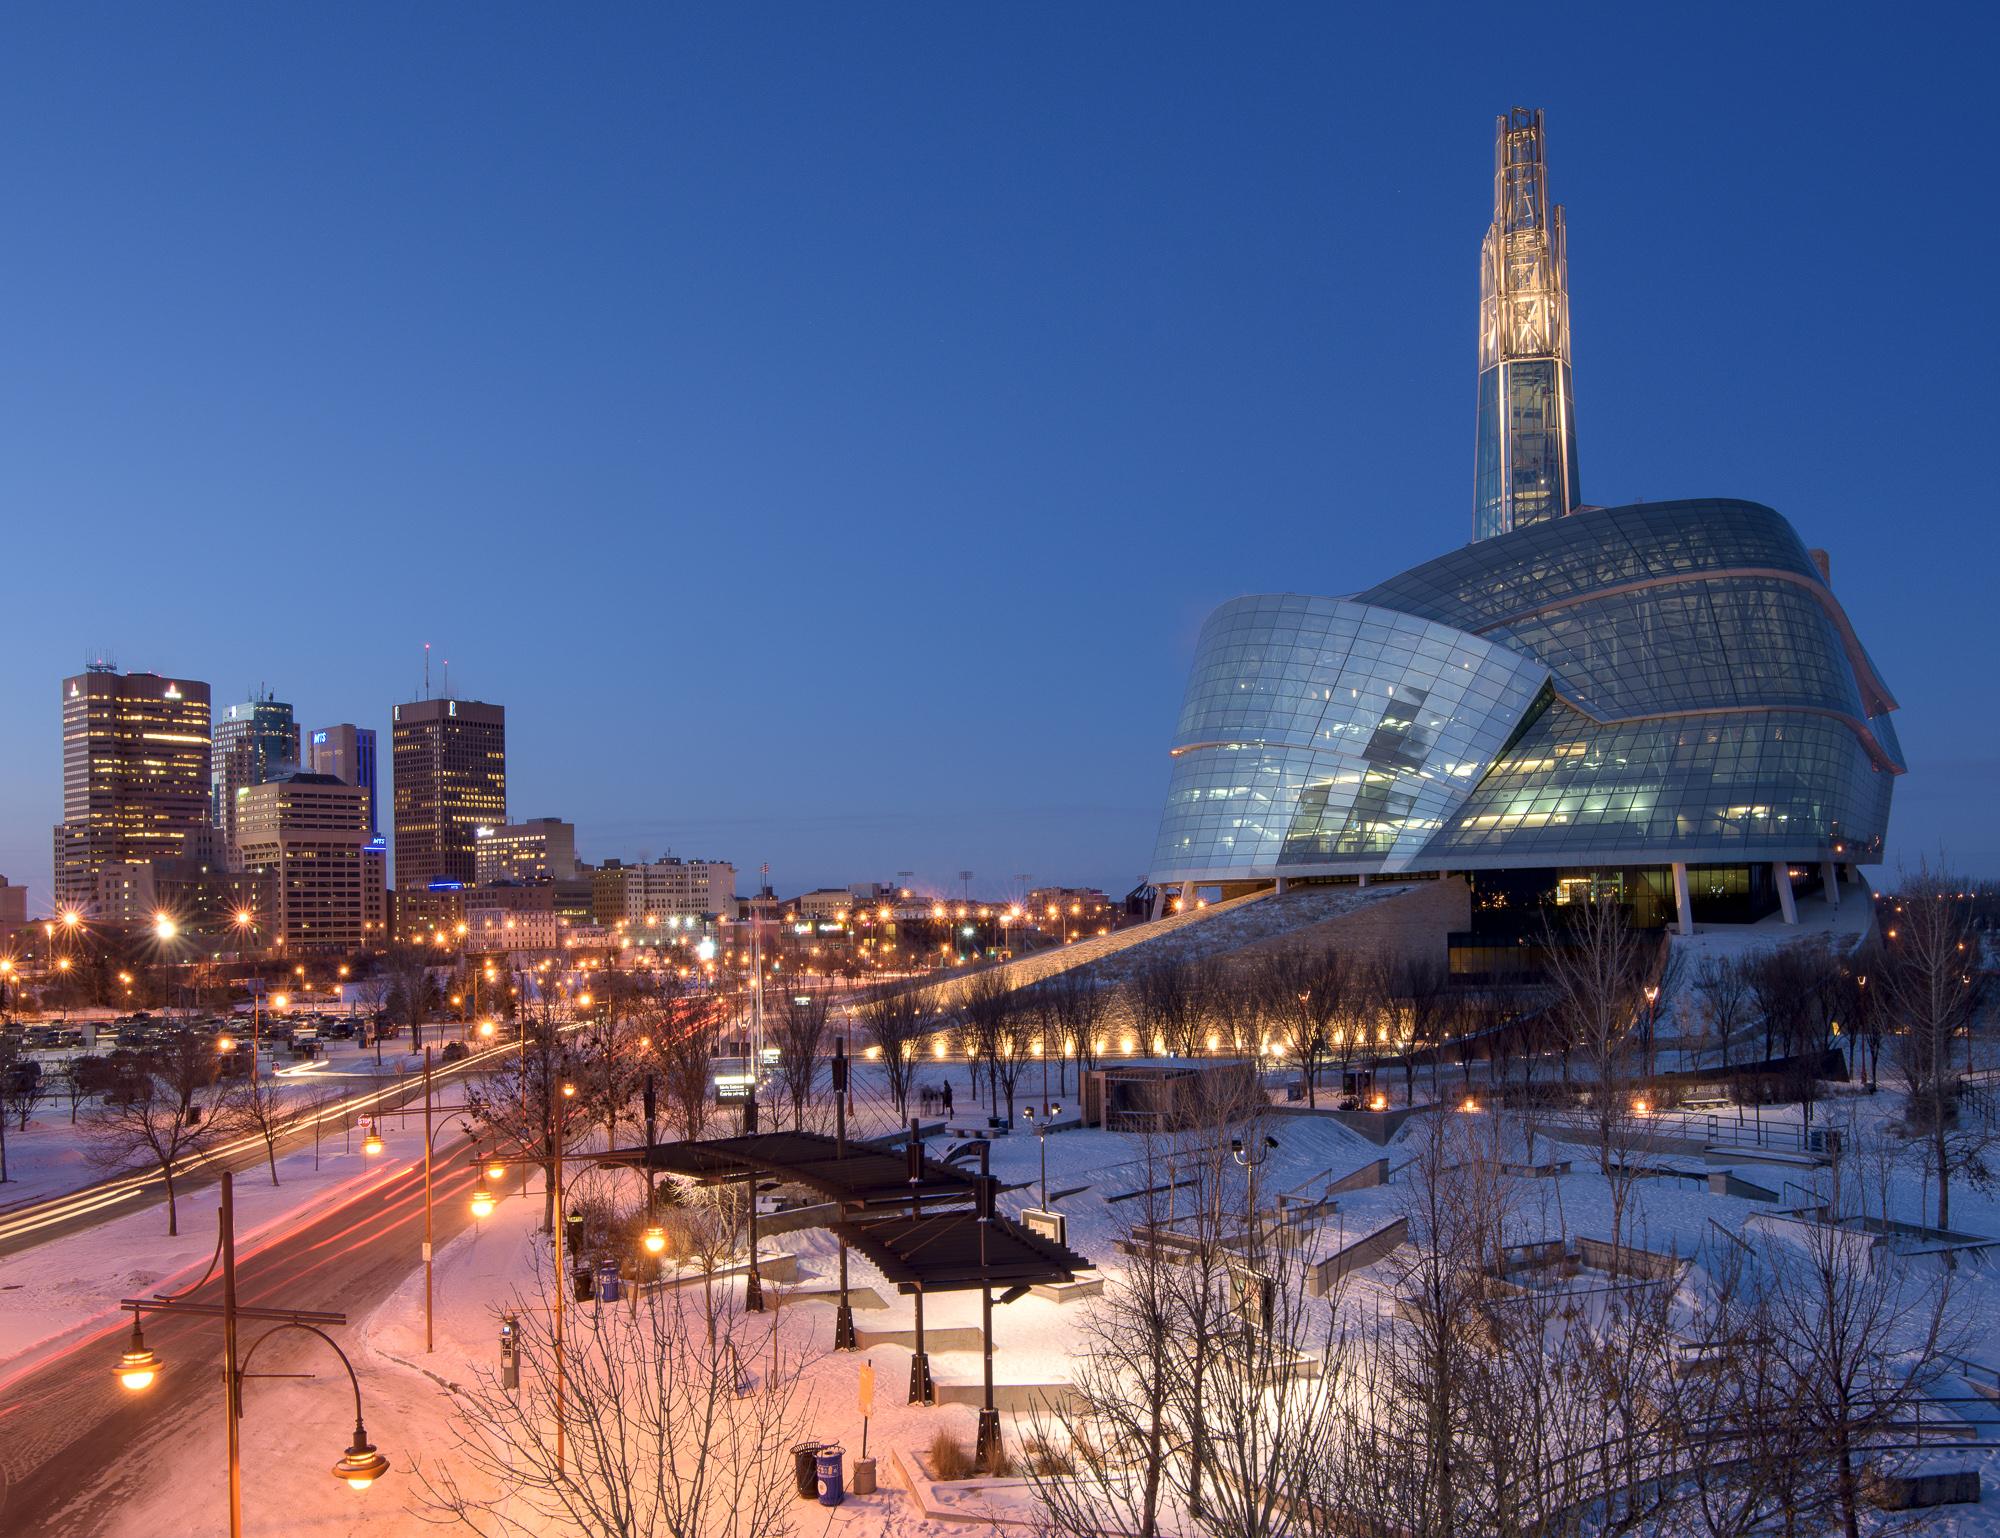 Downtown Winnipeg in the winter. © Robert Lowdon